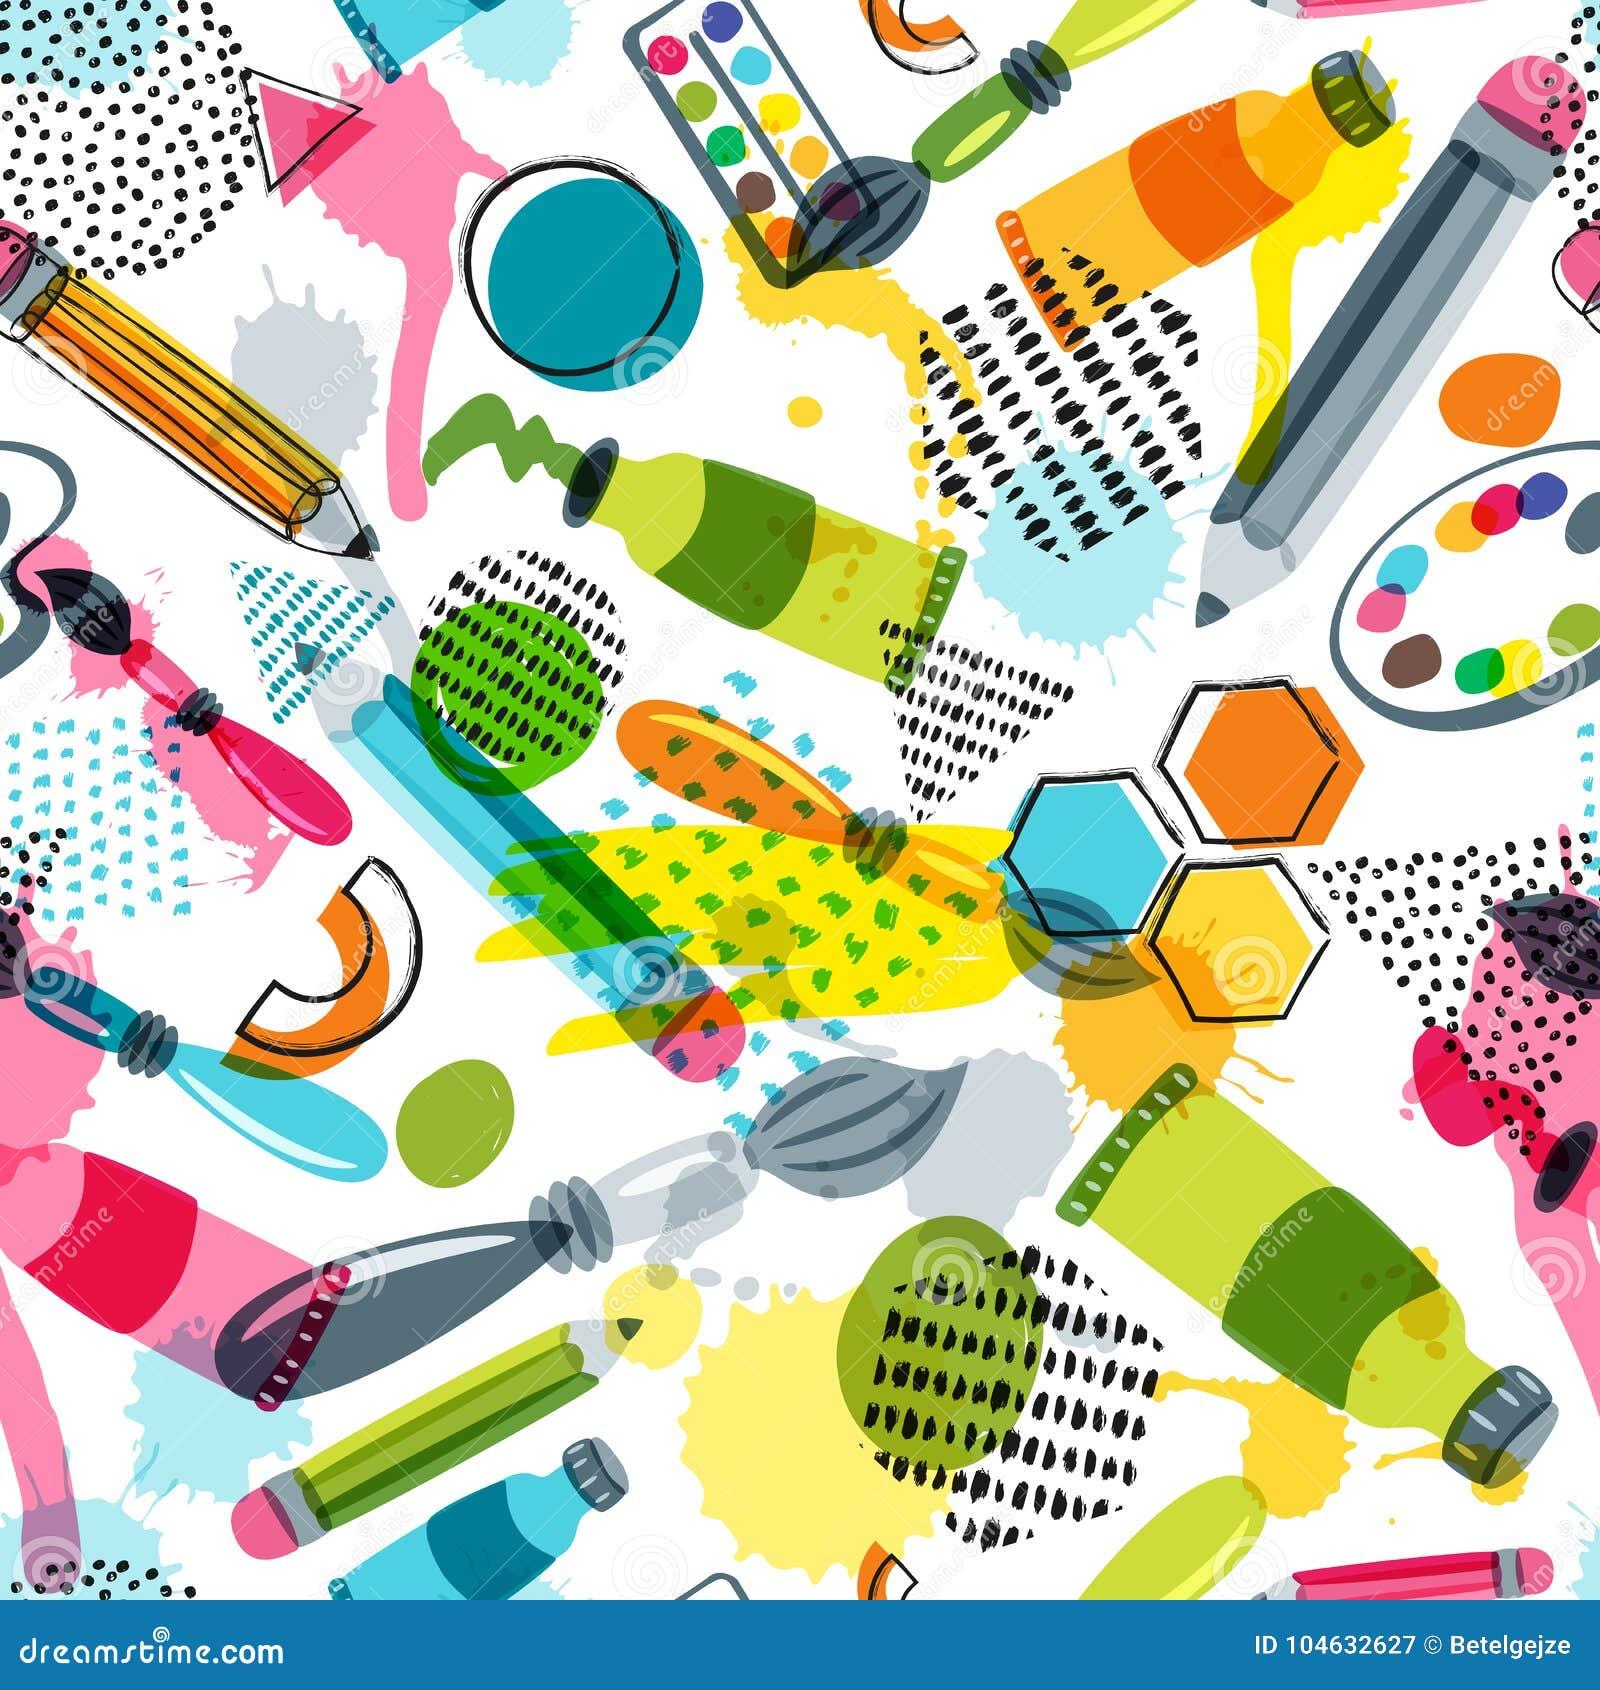 Art Materials For Craft Design Creativity Vector Doodle Seamless